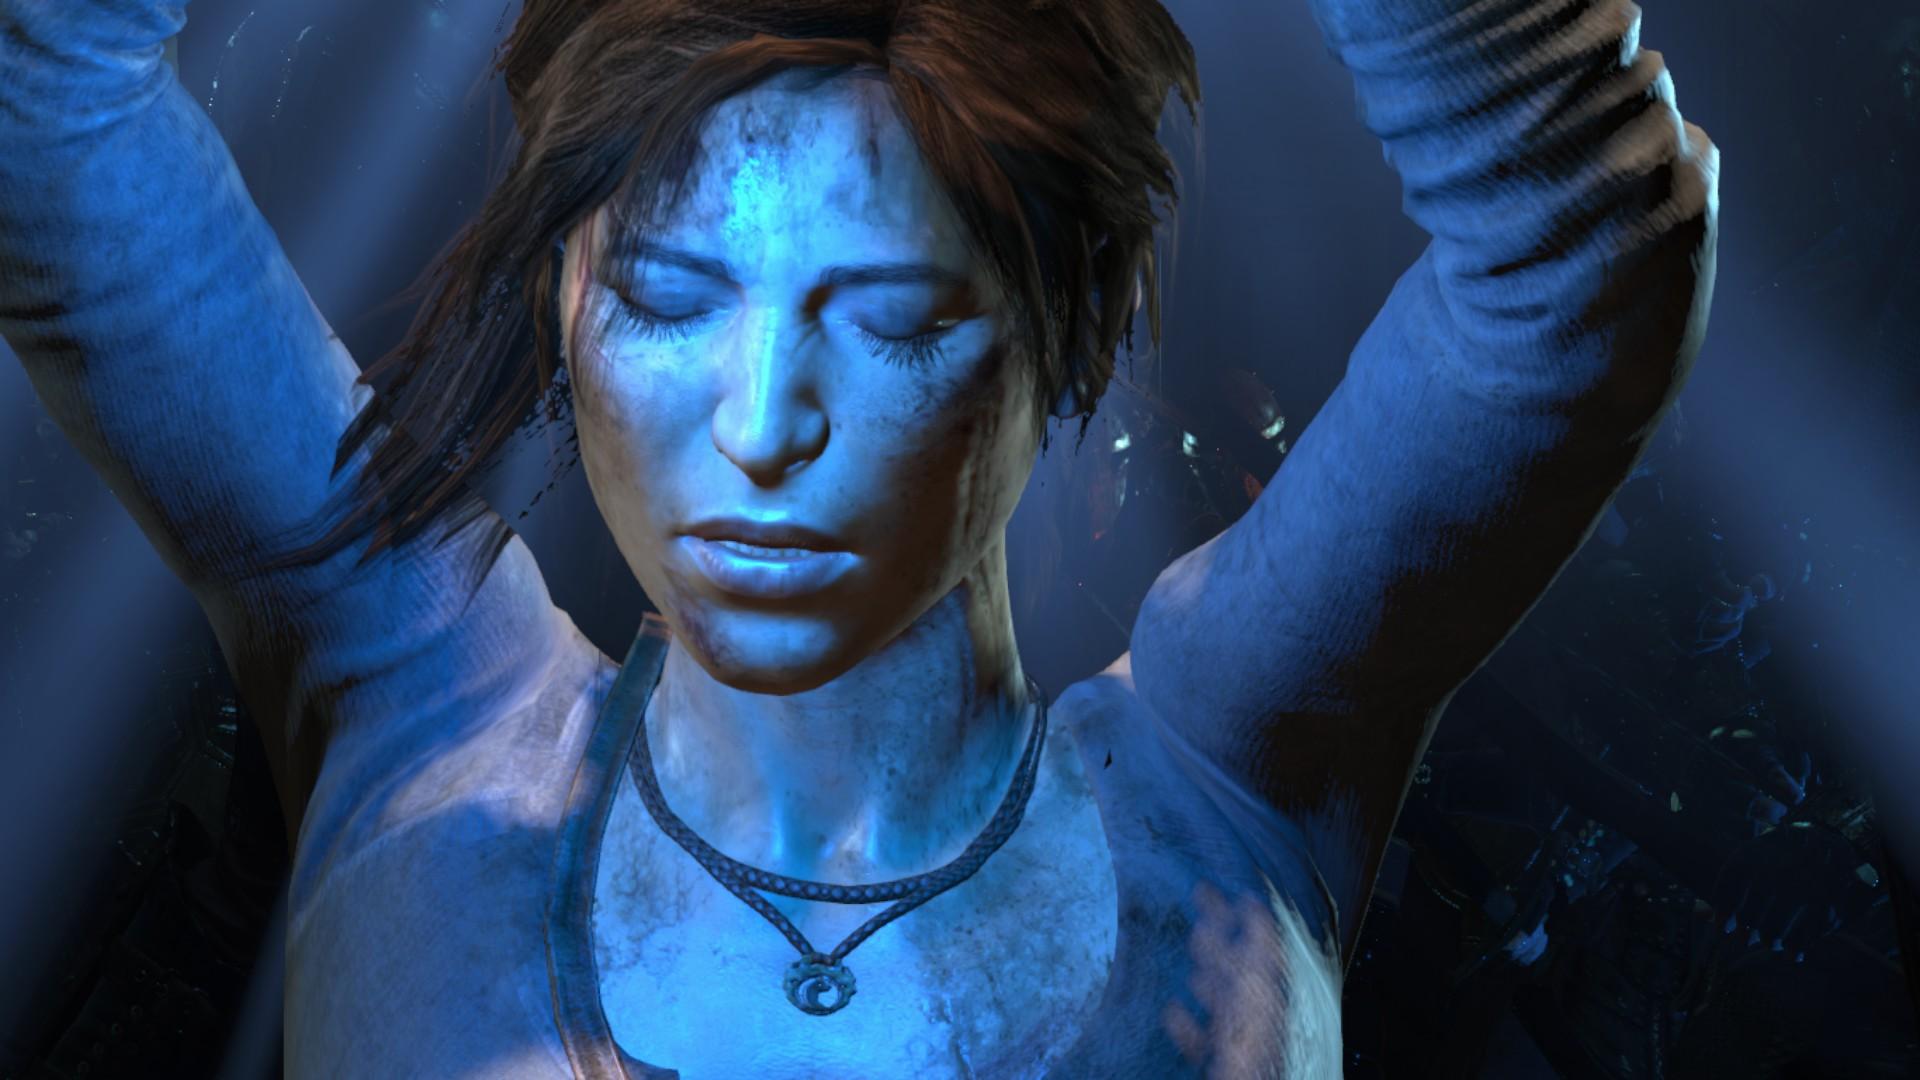 20160804172822_1.jpg - Rise of the Tomb Raider